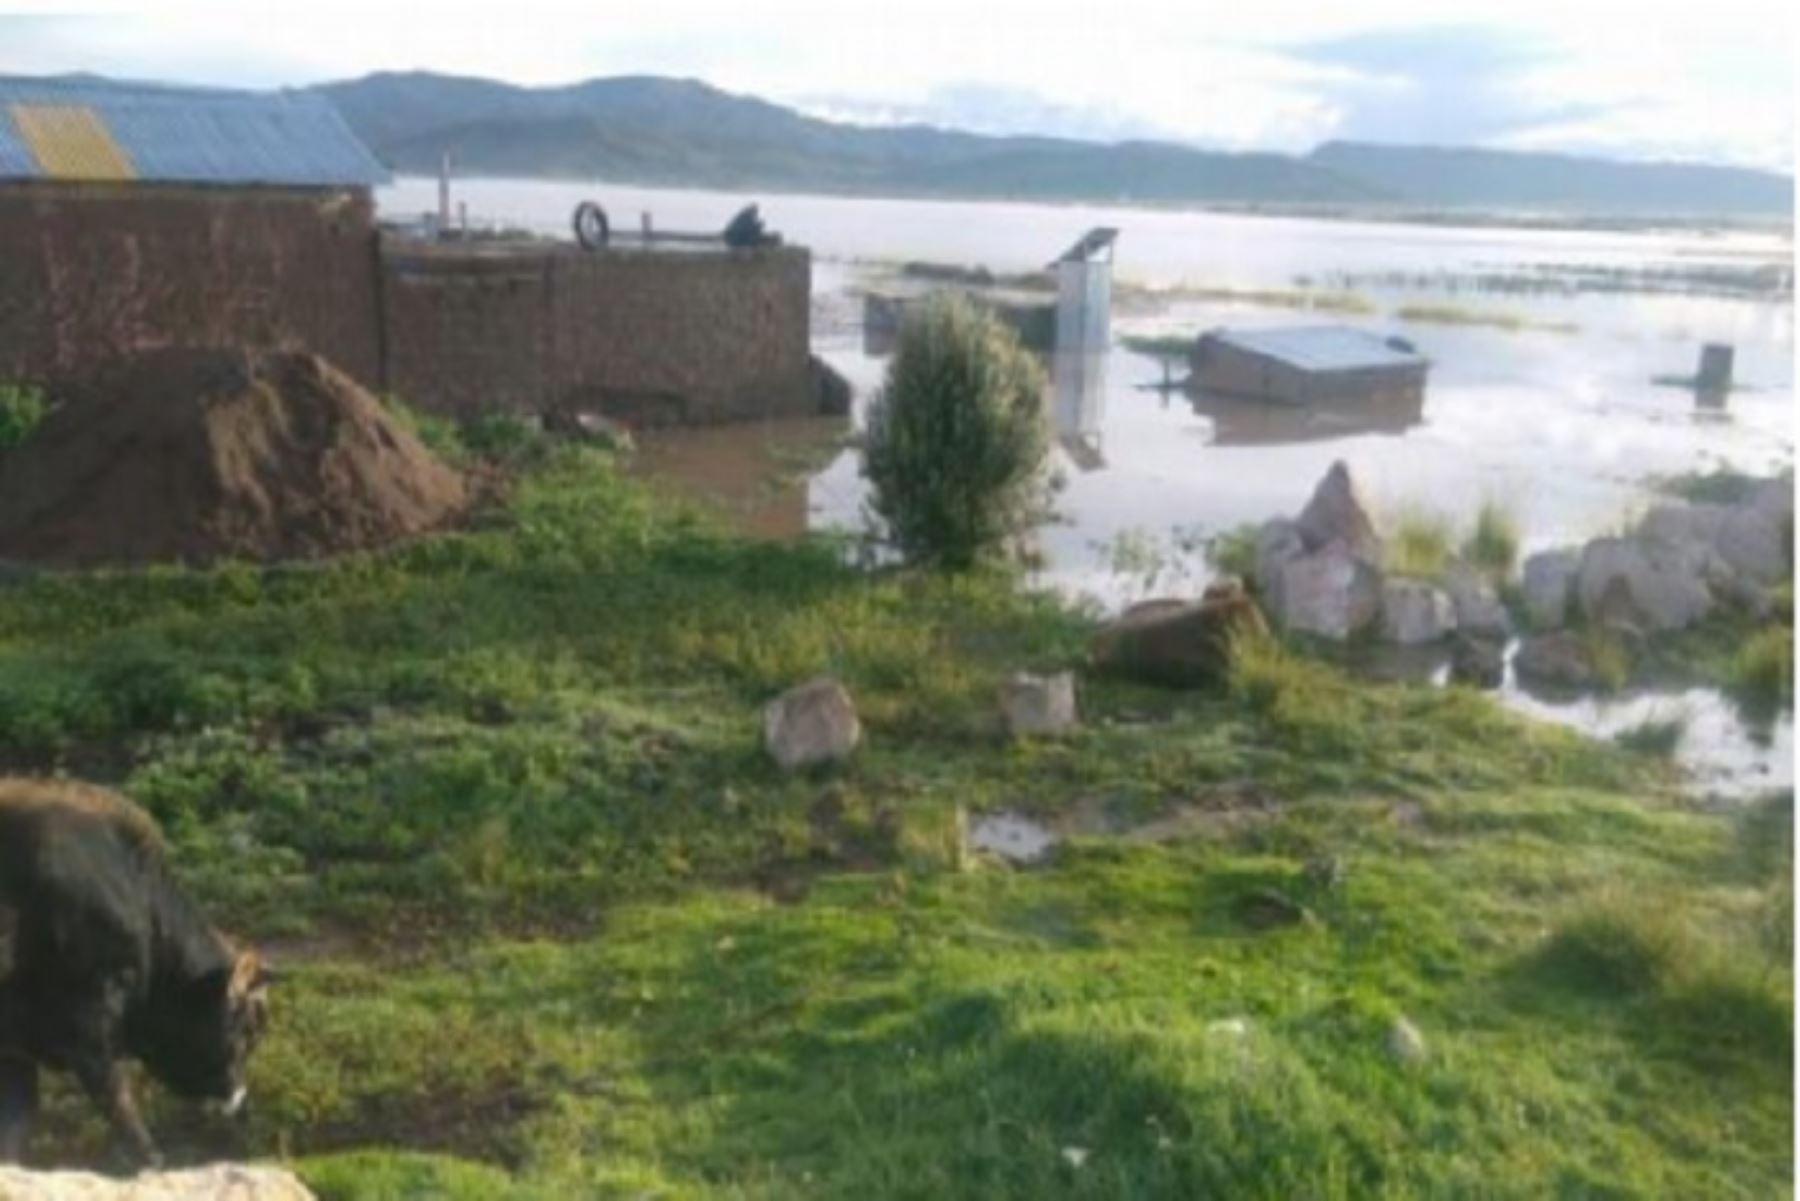 Dos zonas de San Román (Juliaca - San Miguel) se inundaron